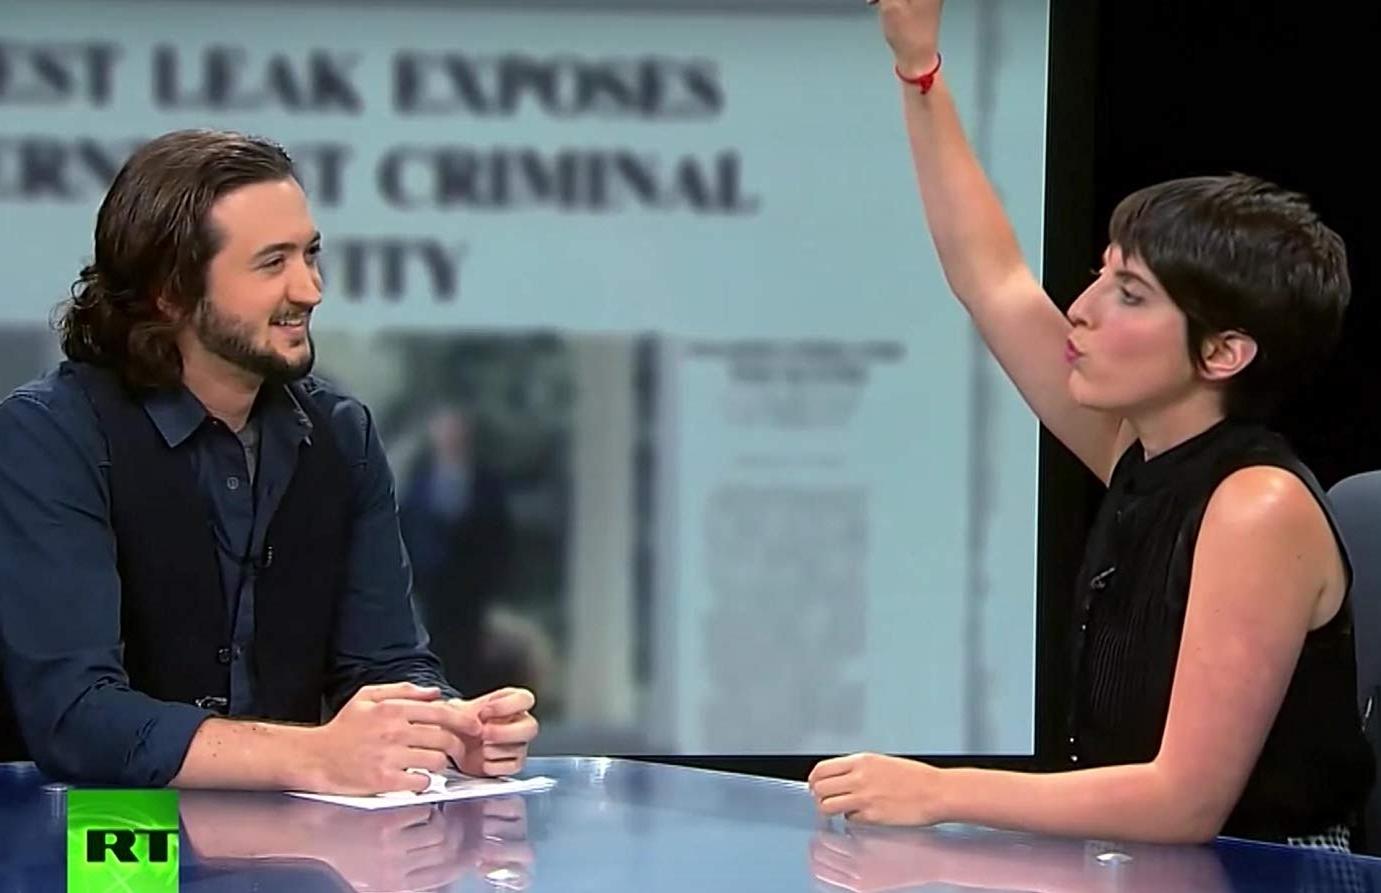 Democrat & Chronicle - Pittsford's Abby Feldman shows satiric teeth